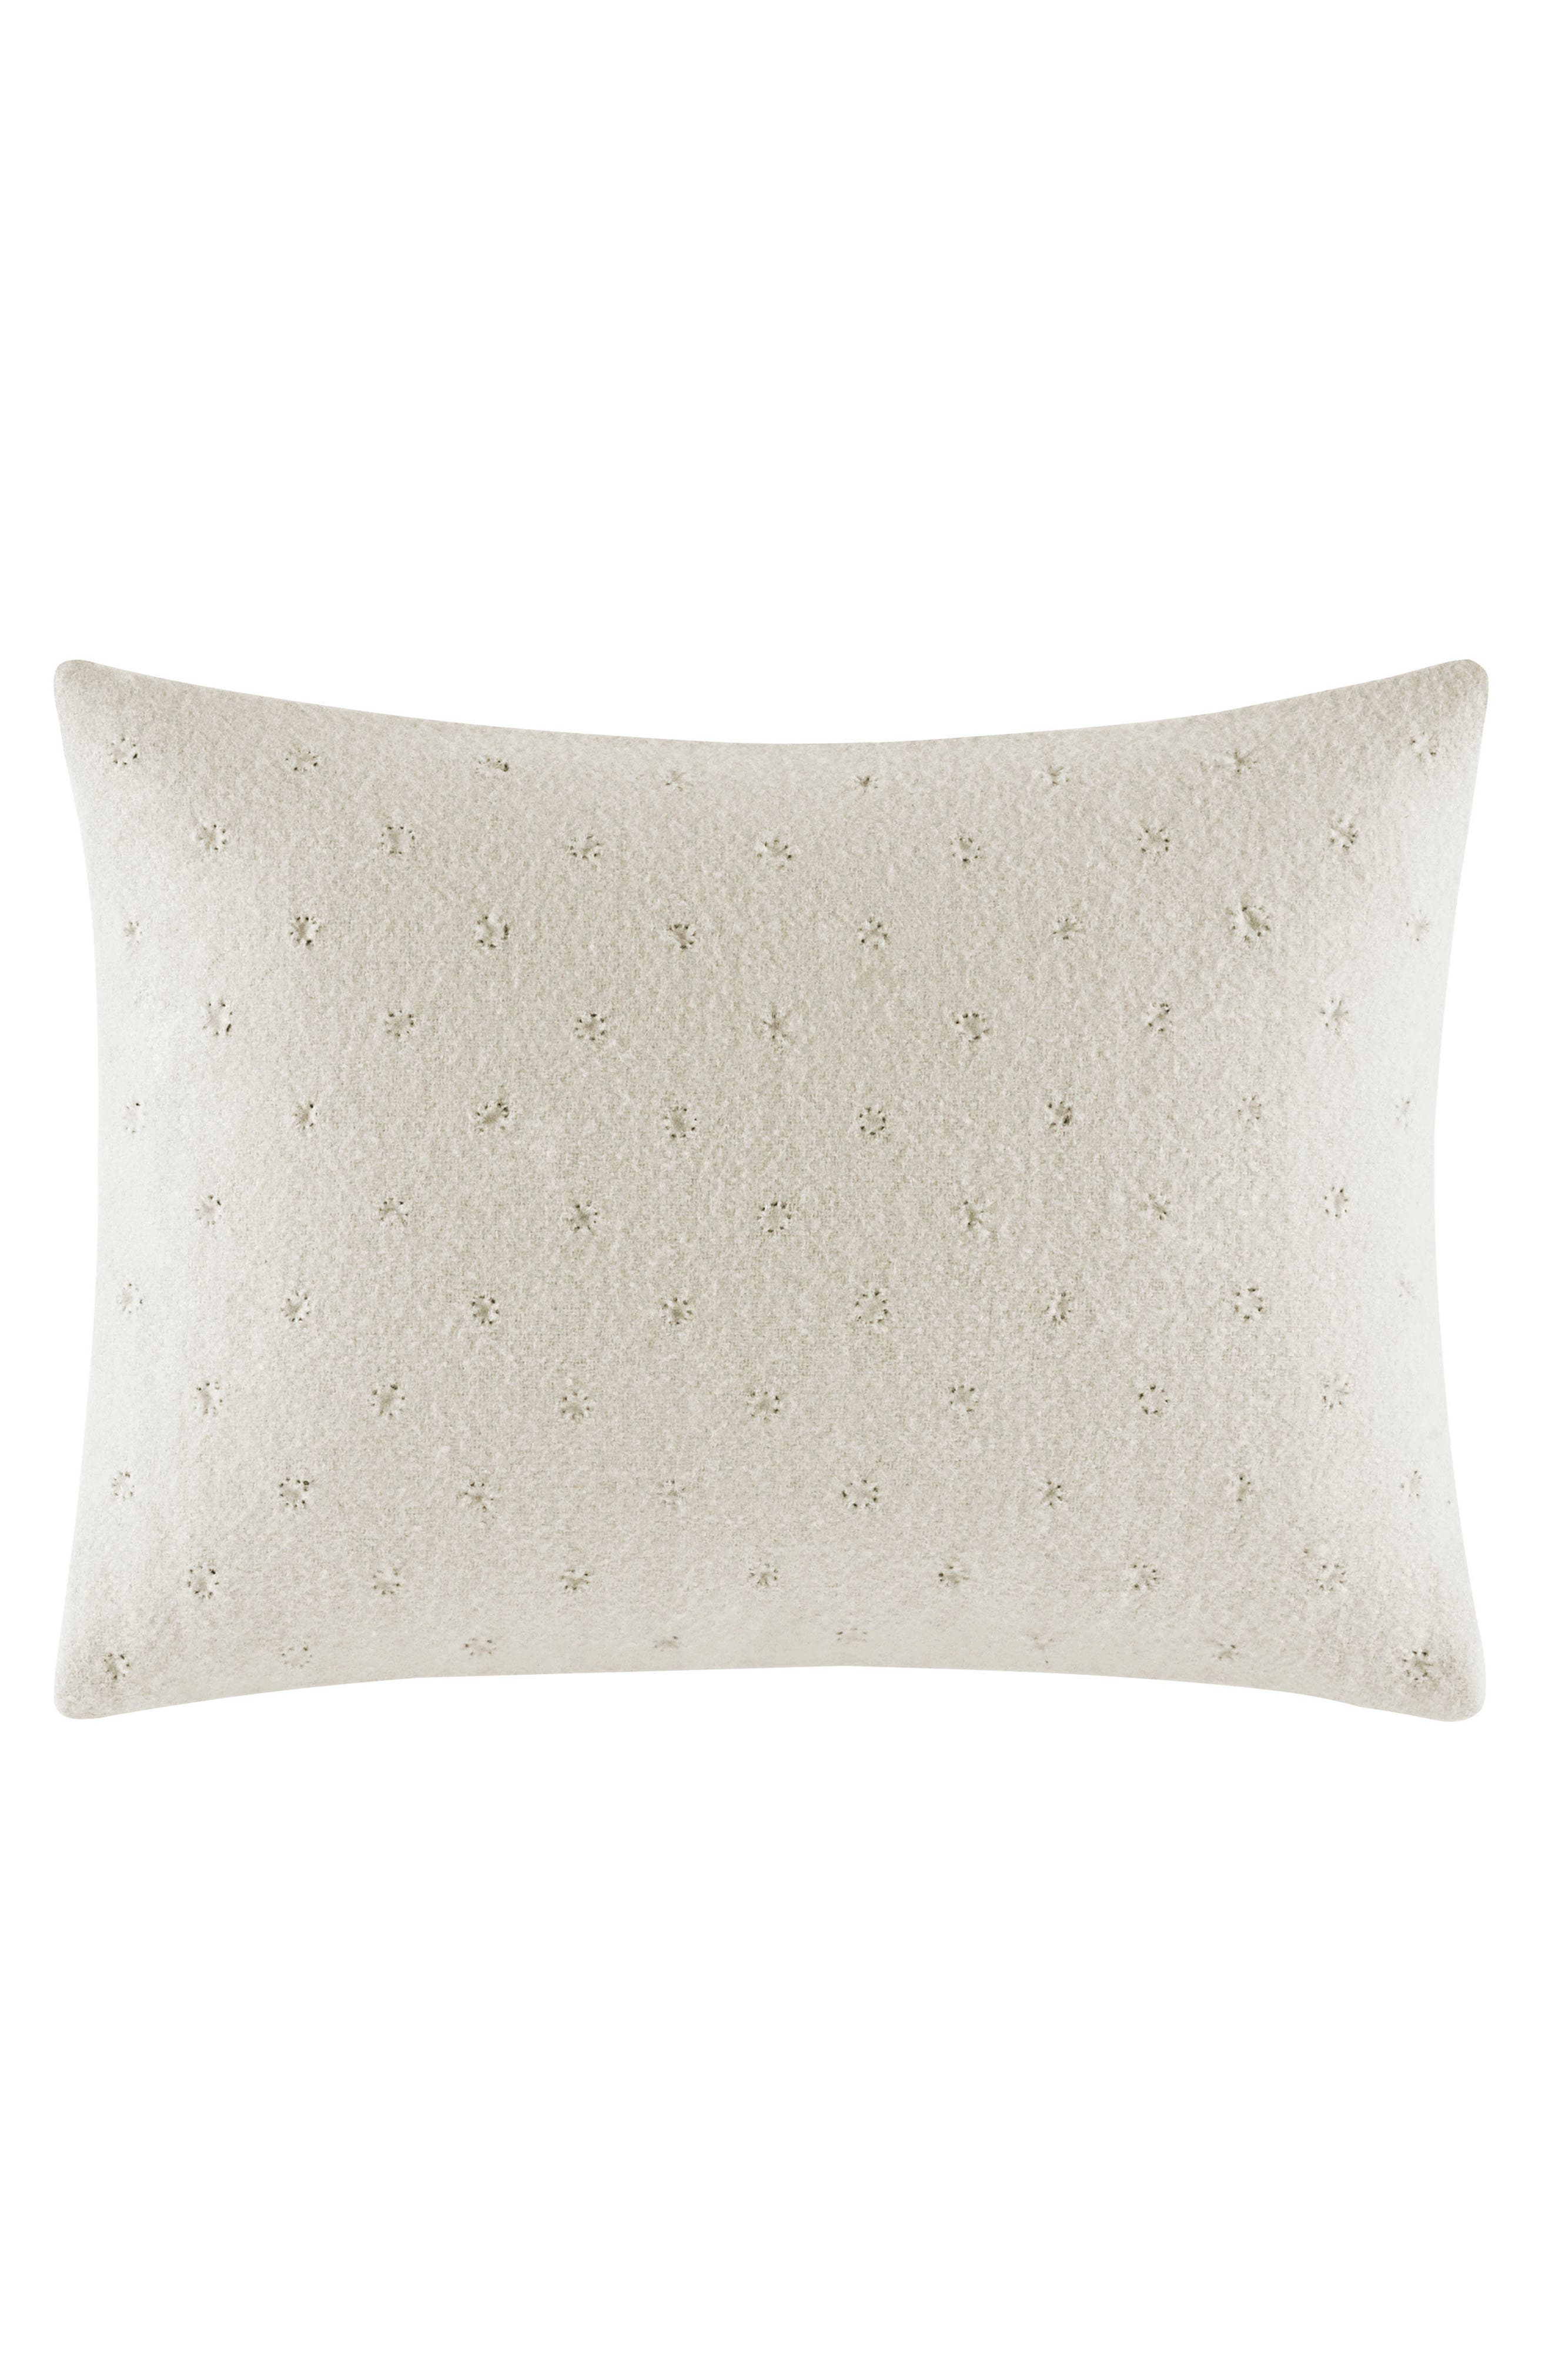 Passementerie Breakfast Accent Pillow,                         Main,                         color, 250